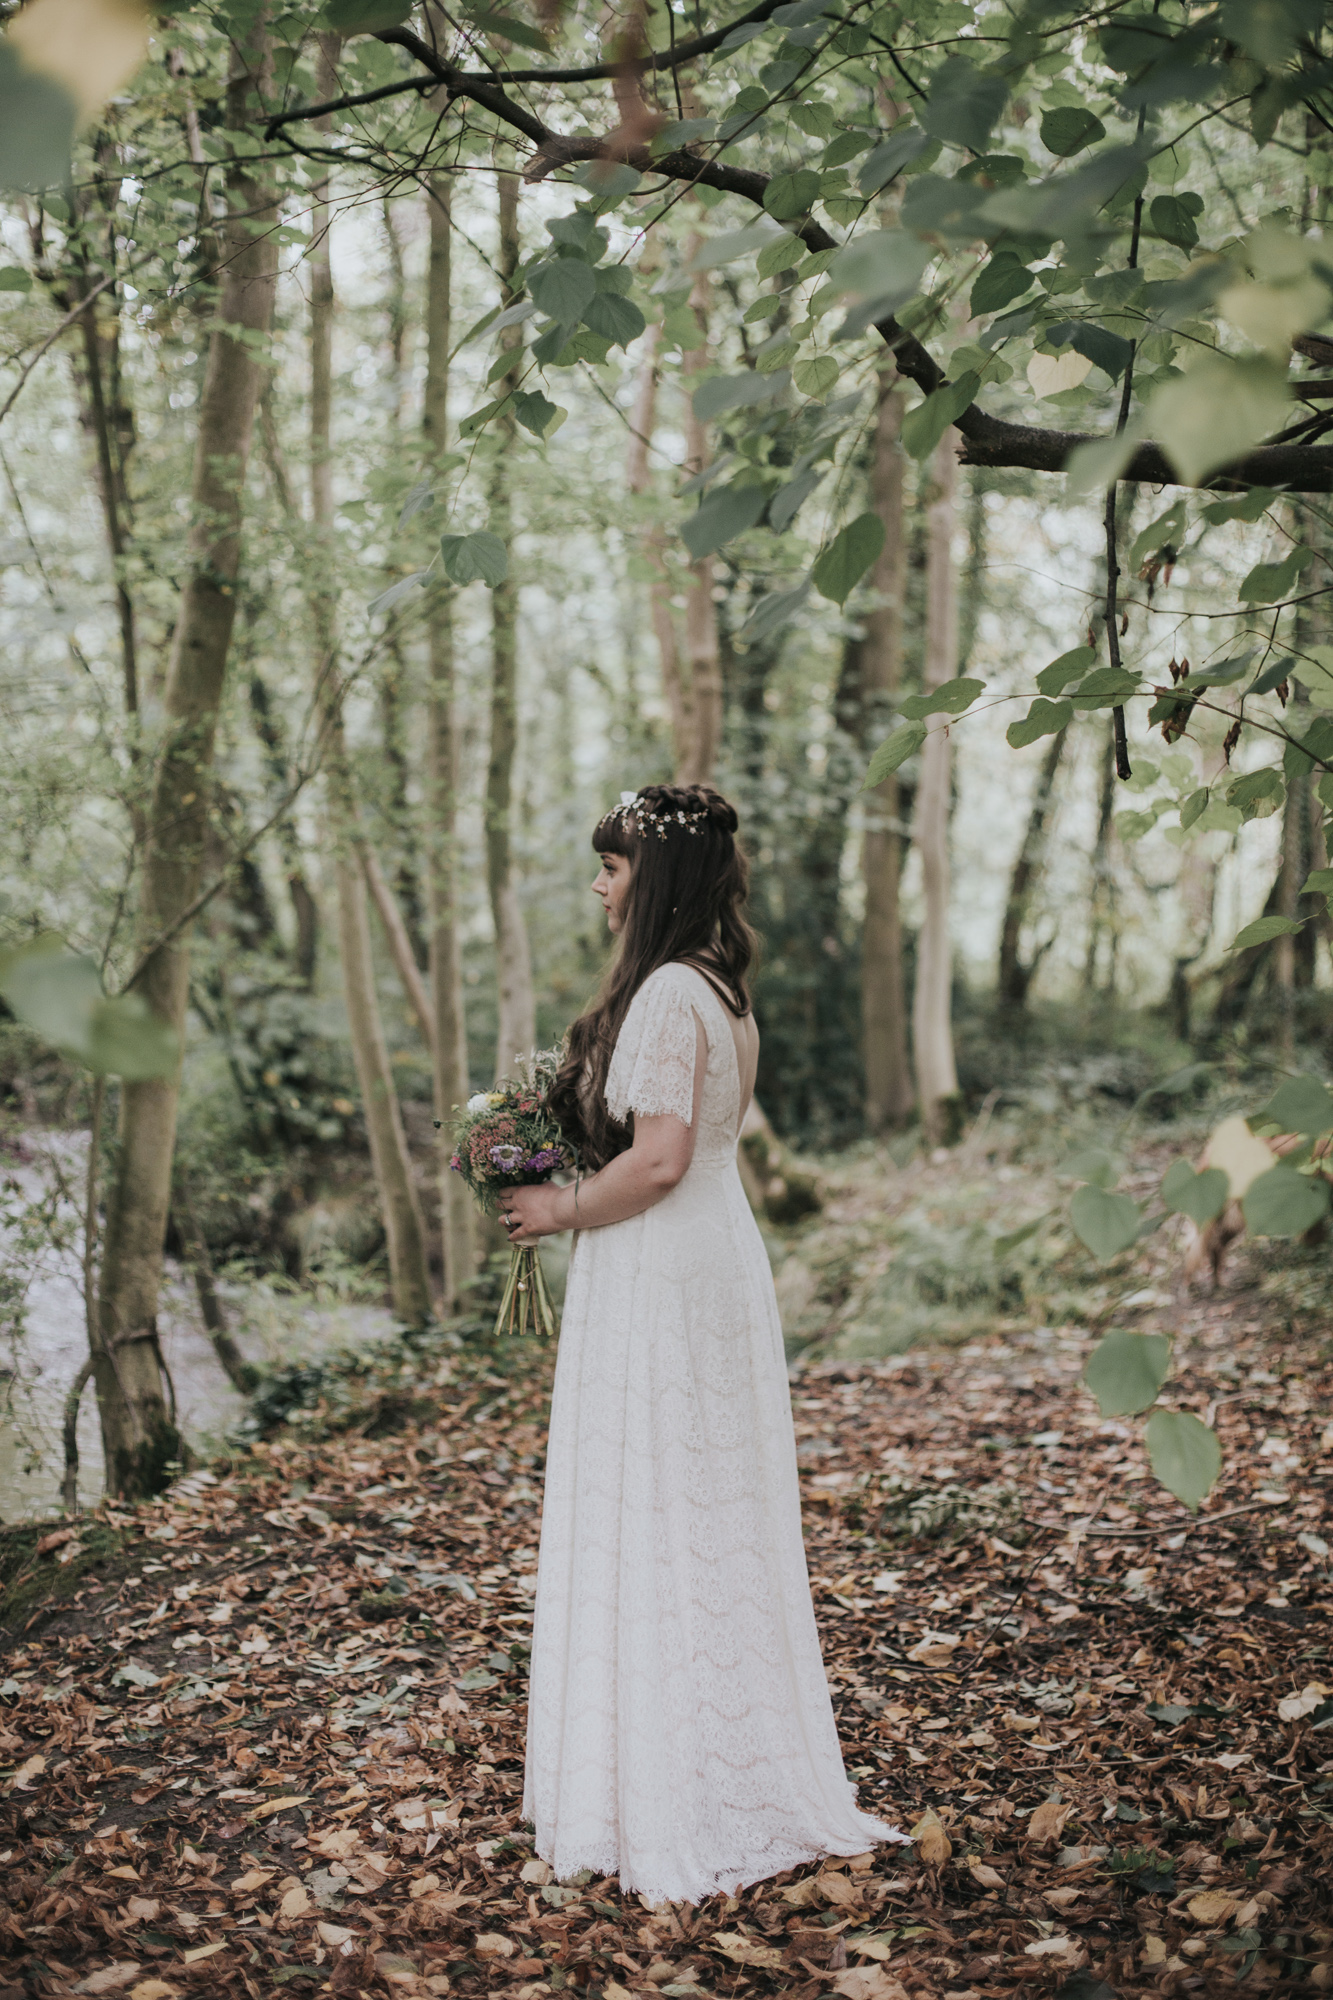 Kristy-Back-Garden-Outdoor-Wedding-Sheffield-Industrial-Warehouse-Wedding-Bohemian-Kate-Beaumont-Dahlia-Dress-26.jpg